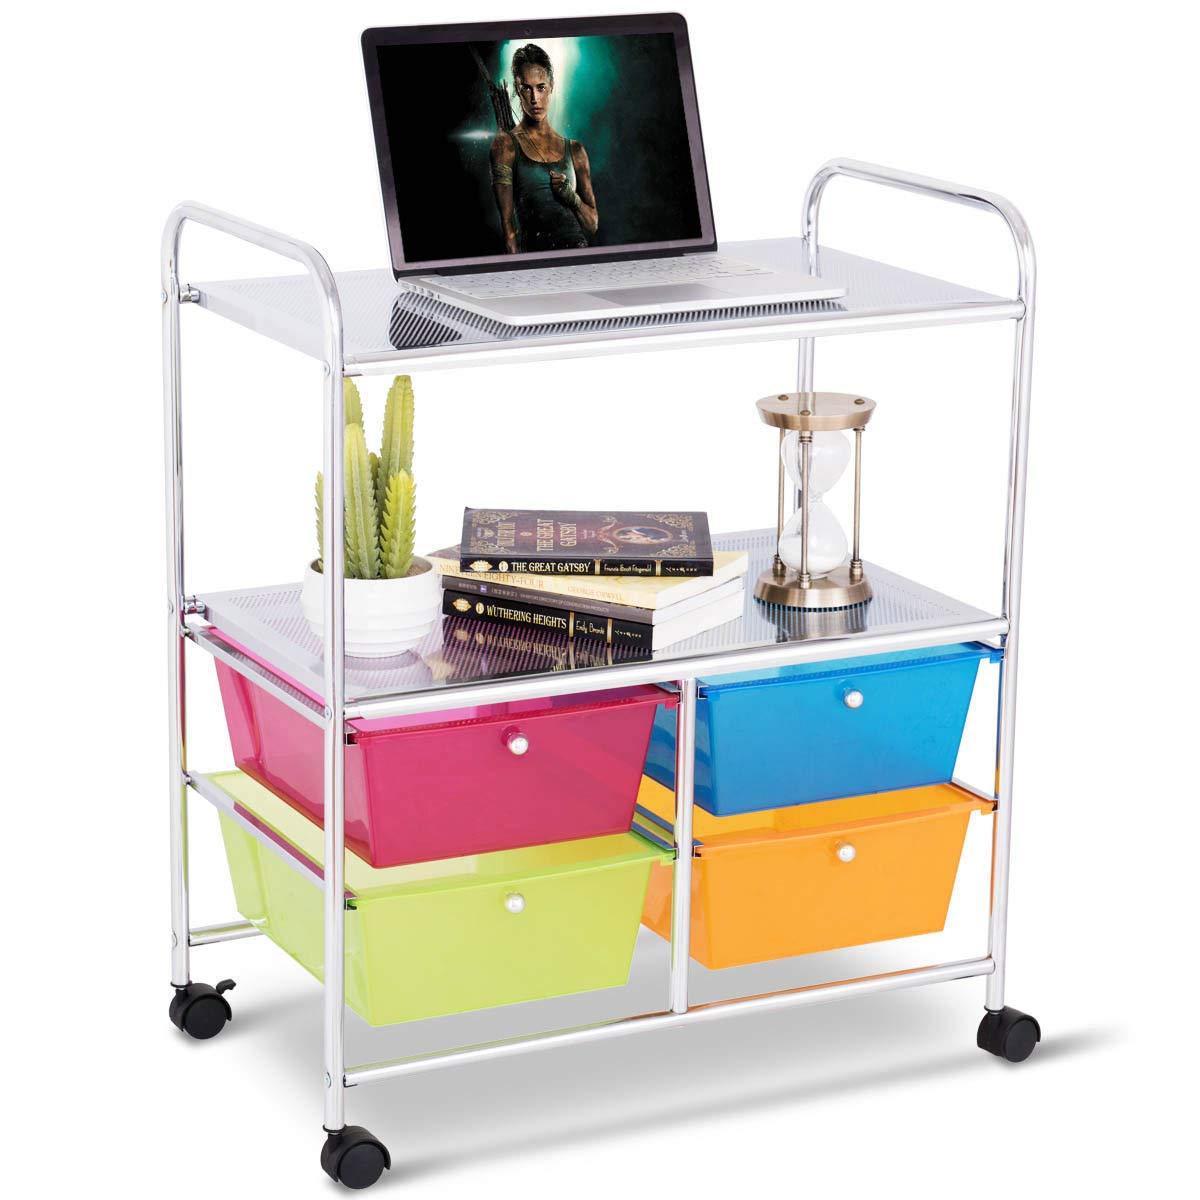 GHP 25.0''x14.5''x29.5'' Steel & Plastic 2 Metal Shelves & 4 Drawers Rolling Storage Cart